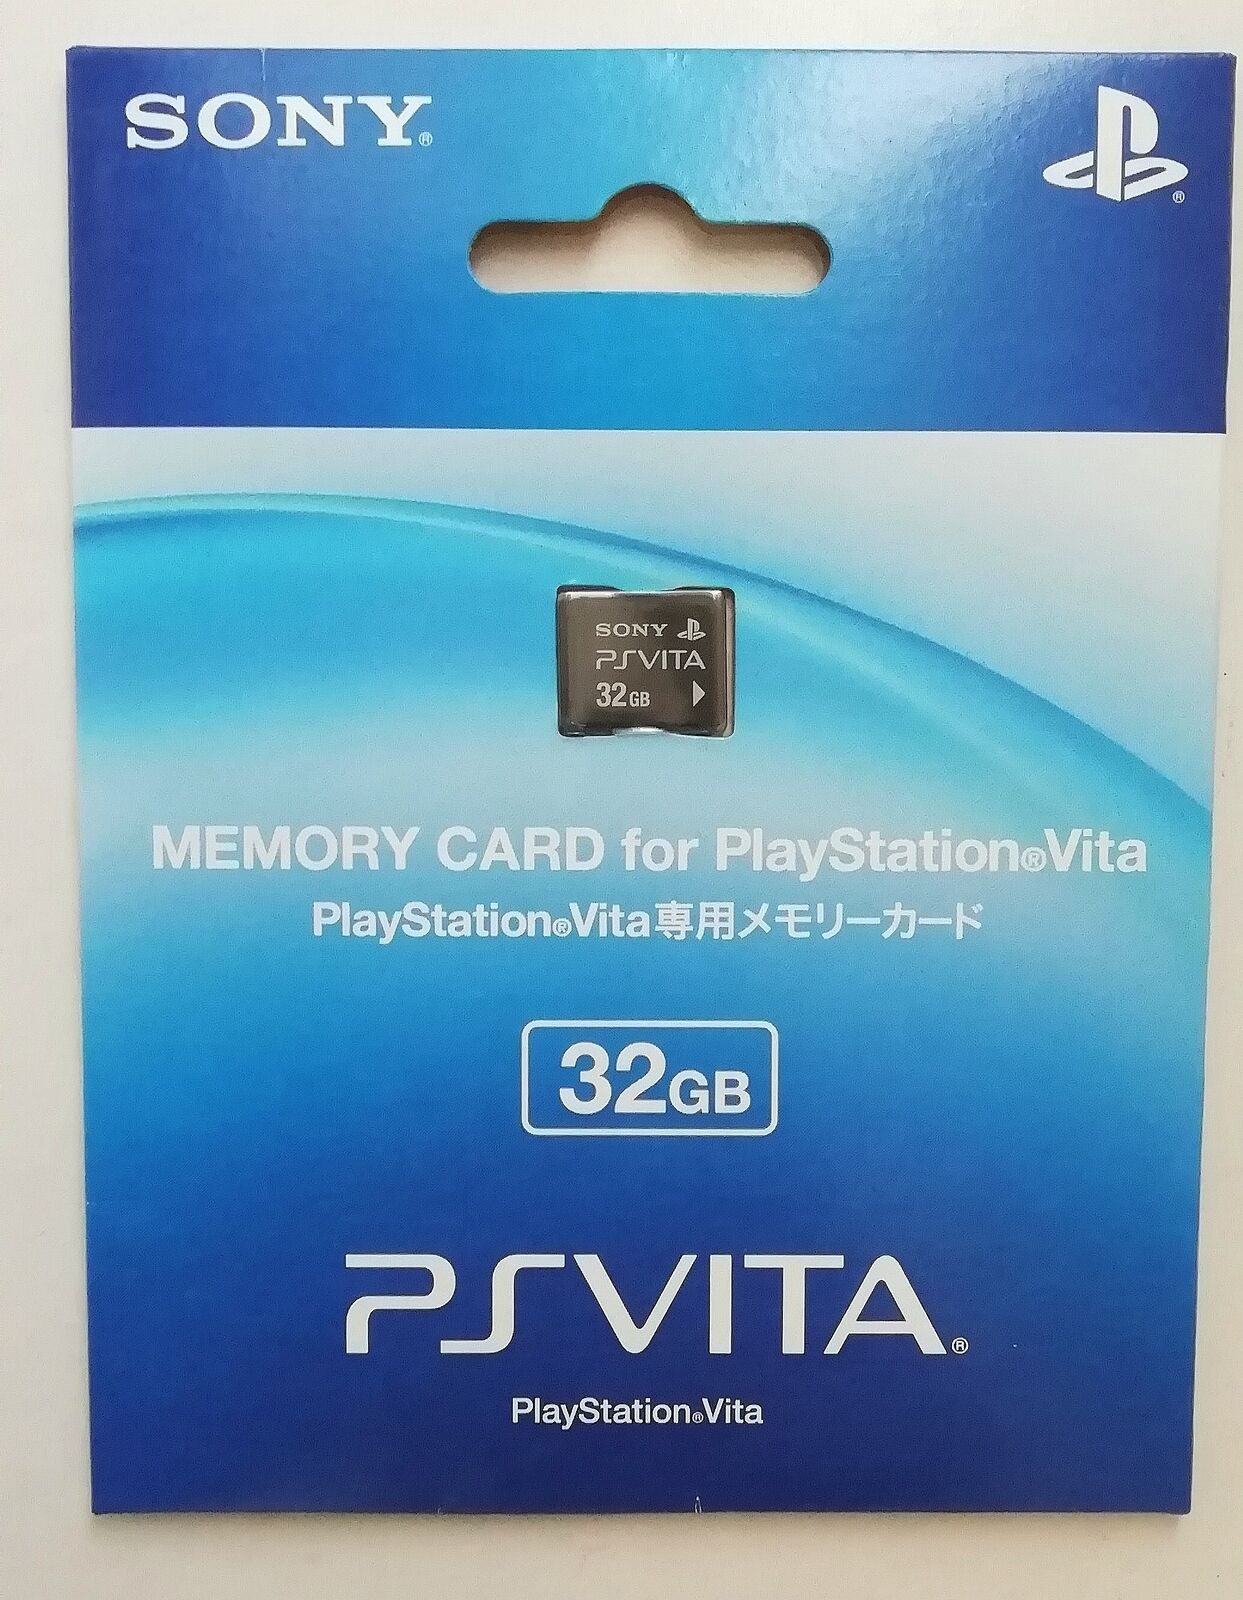 SONY PS VITA 32GB Memory Card For Play Station Vita PSVITA Game import Japan NEW